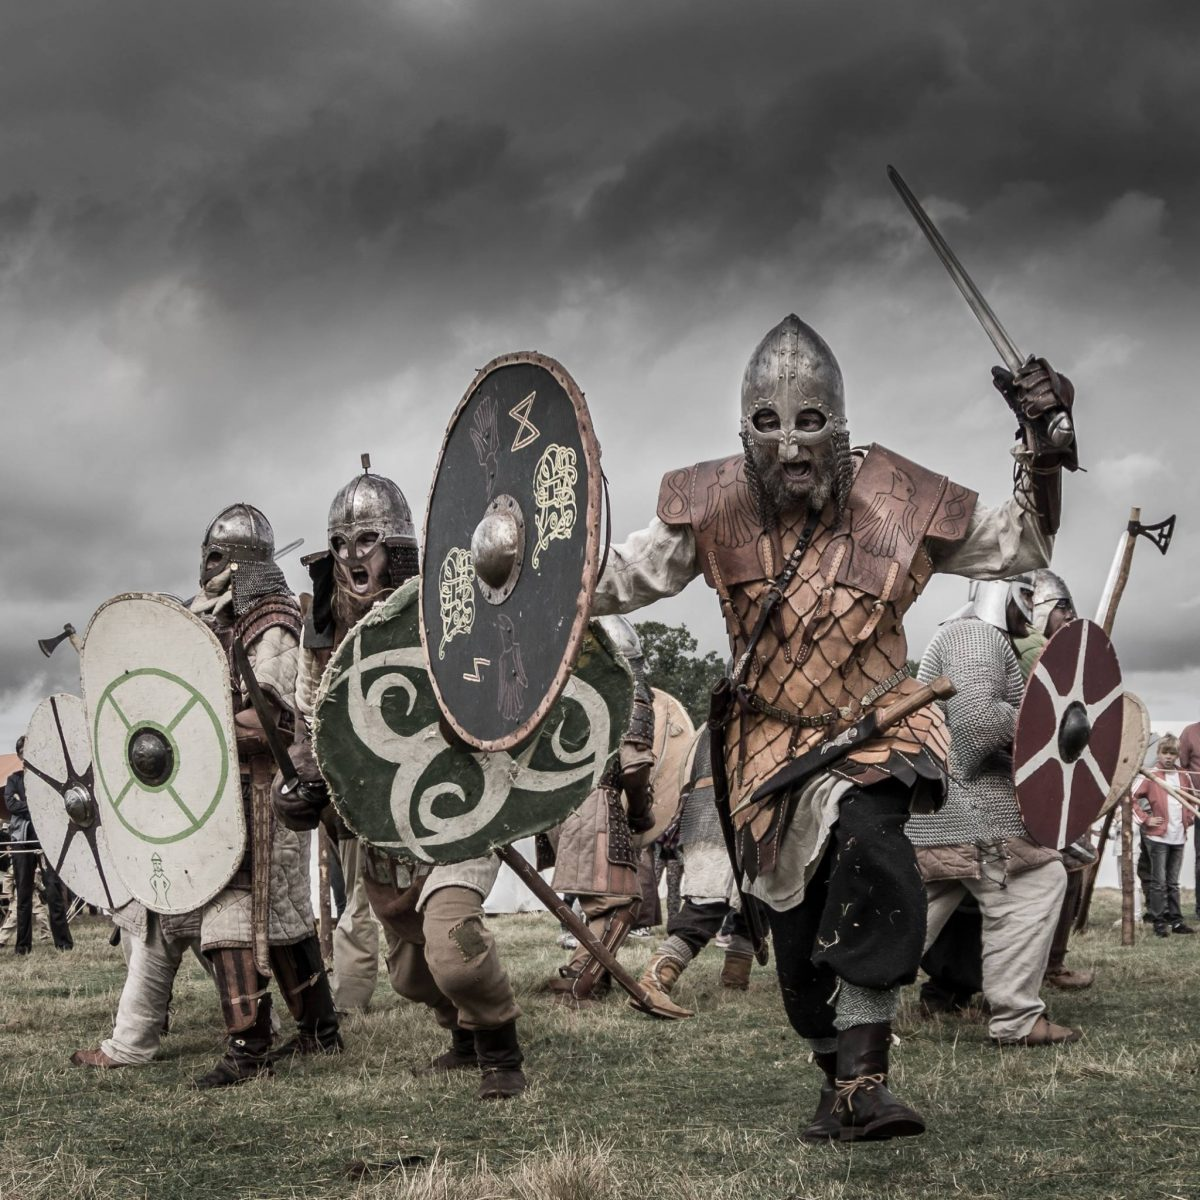 Vikingos al poder en Gudahagen, Escania, Suecia <br> Foto: gudahagen.se